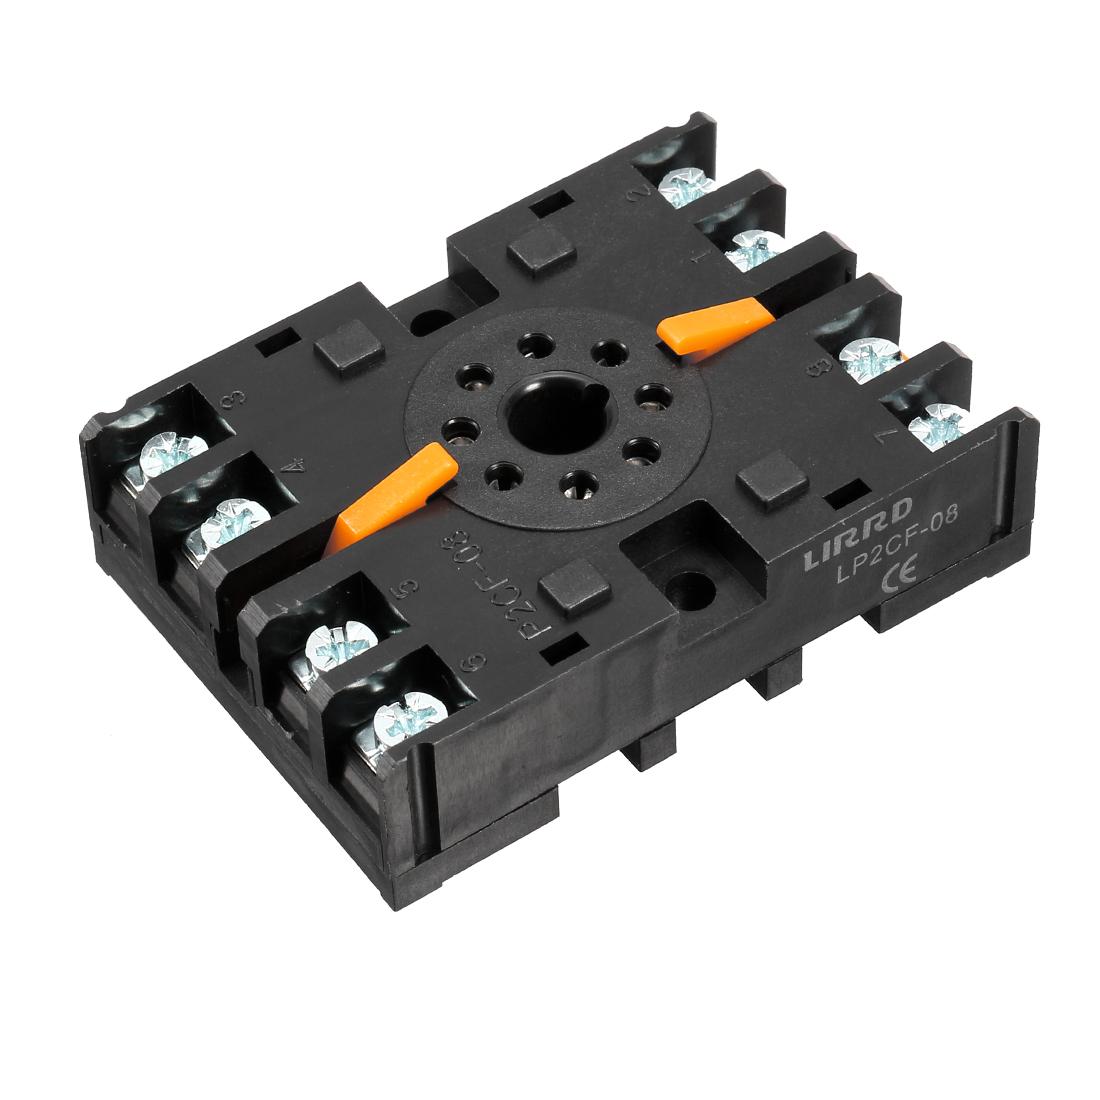 AC 250V 10A, 8P DIN Rail Mount Power Relay Socket Base Holder